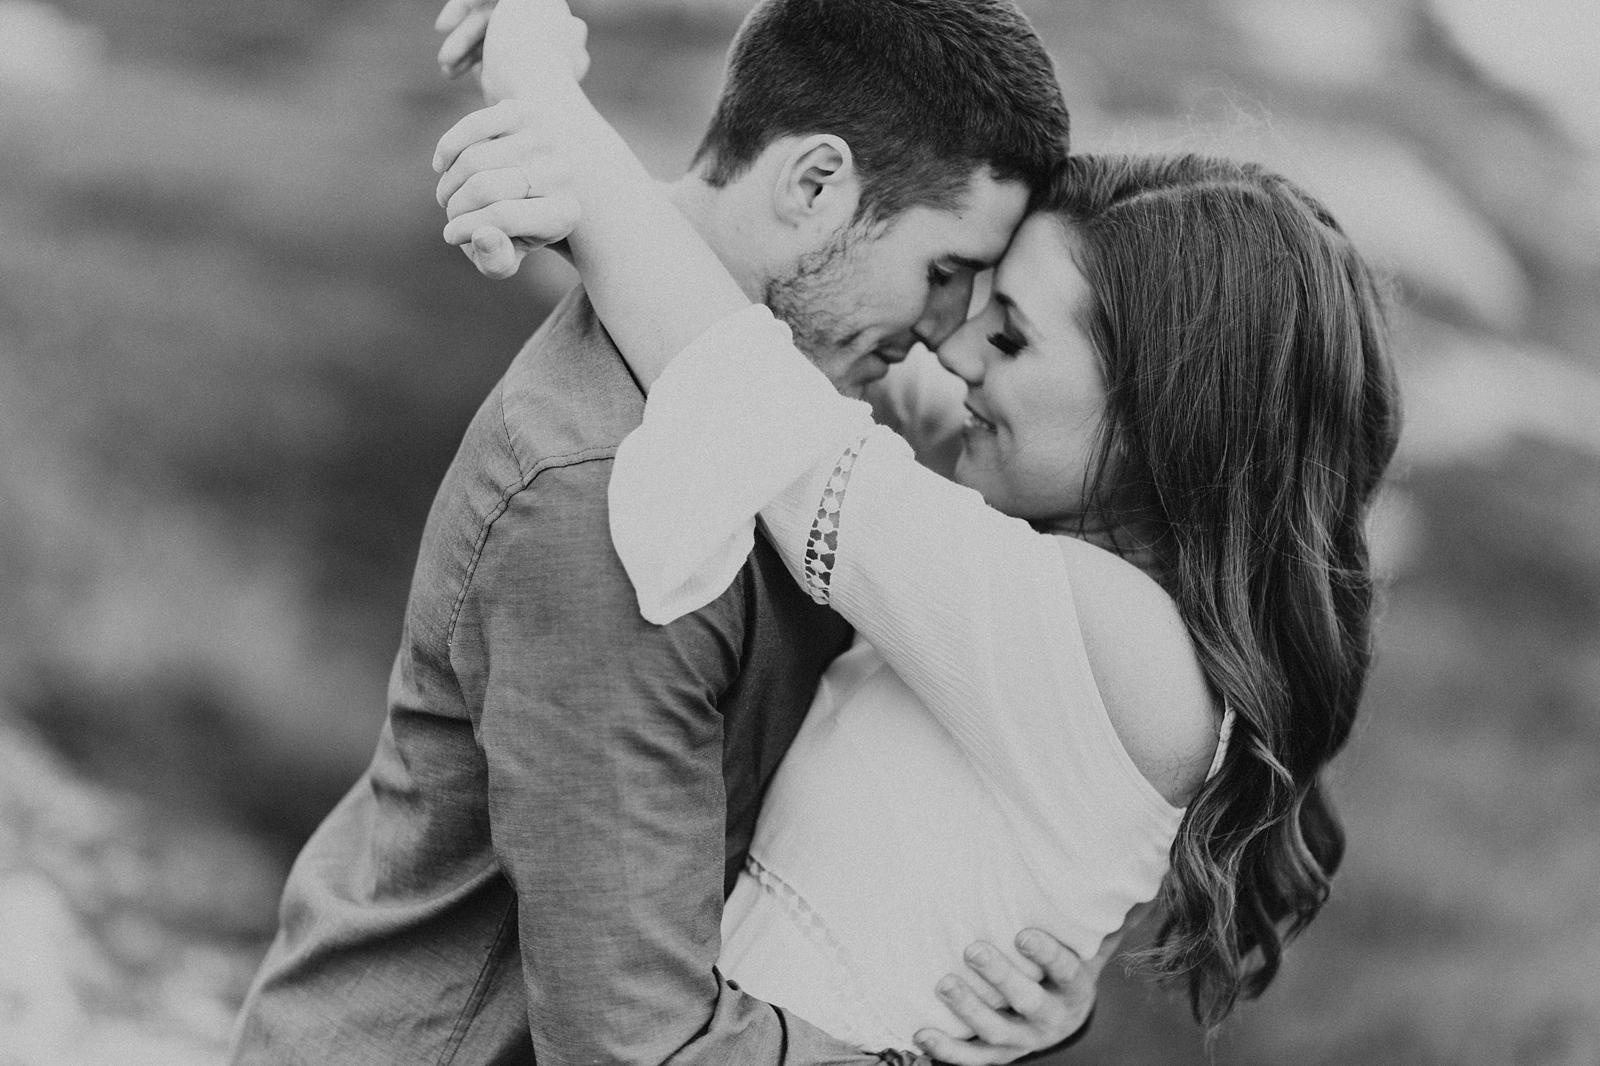 Halifax-Wedding-Photographer_Annie&Ryan_Ocean-Engagement-Shoot_15.jpg